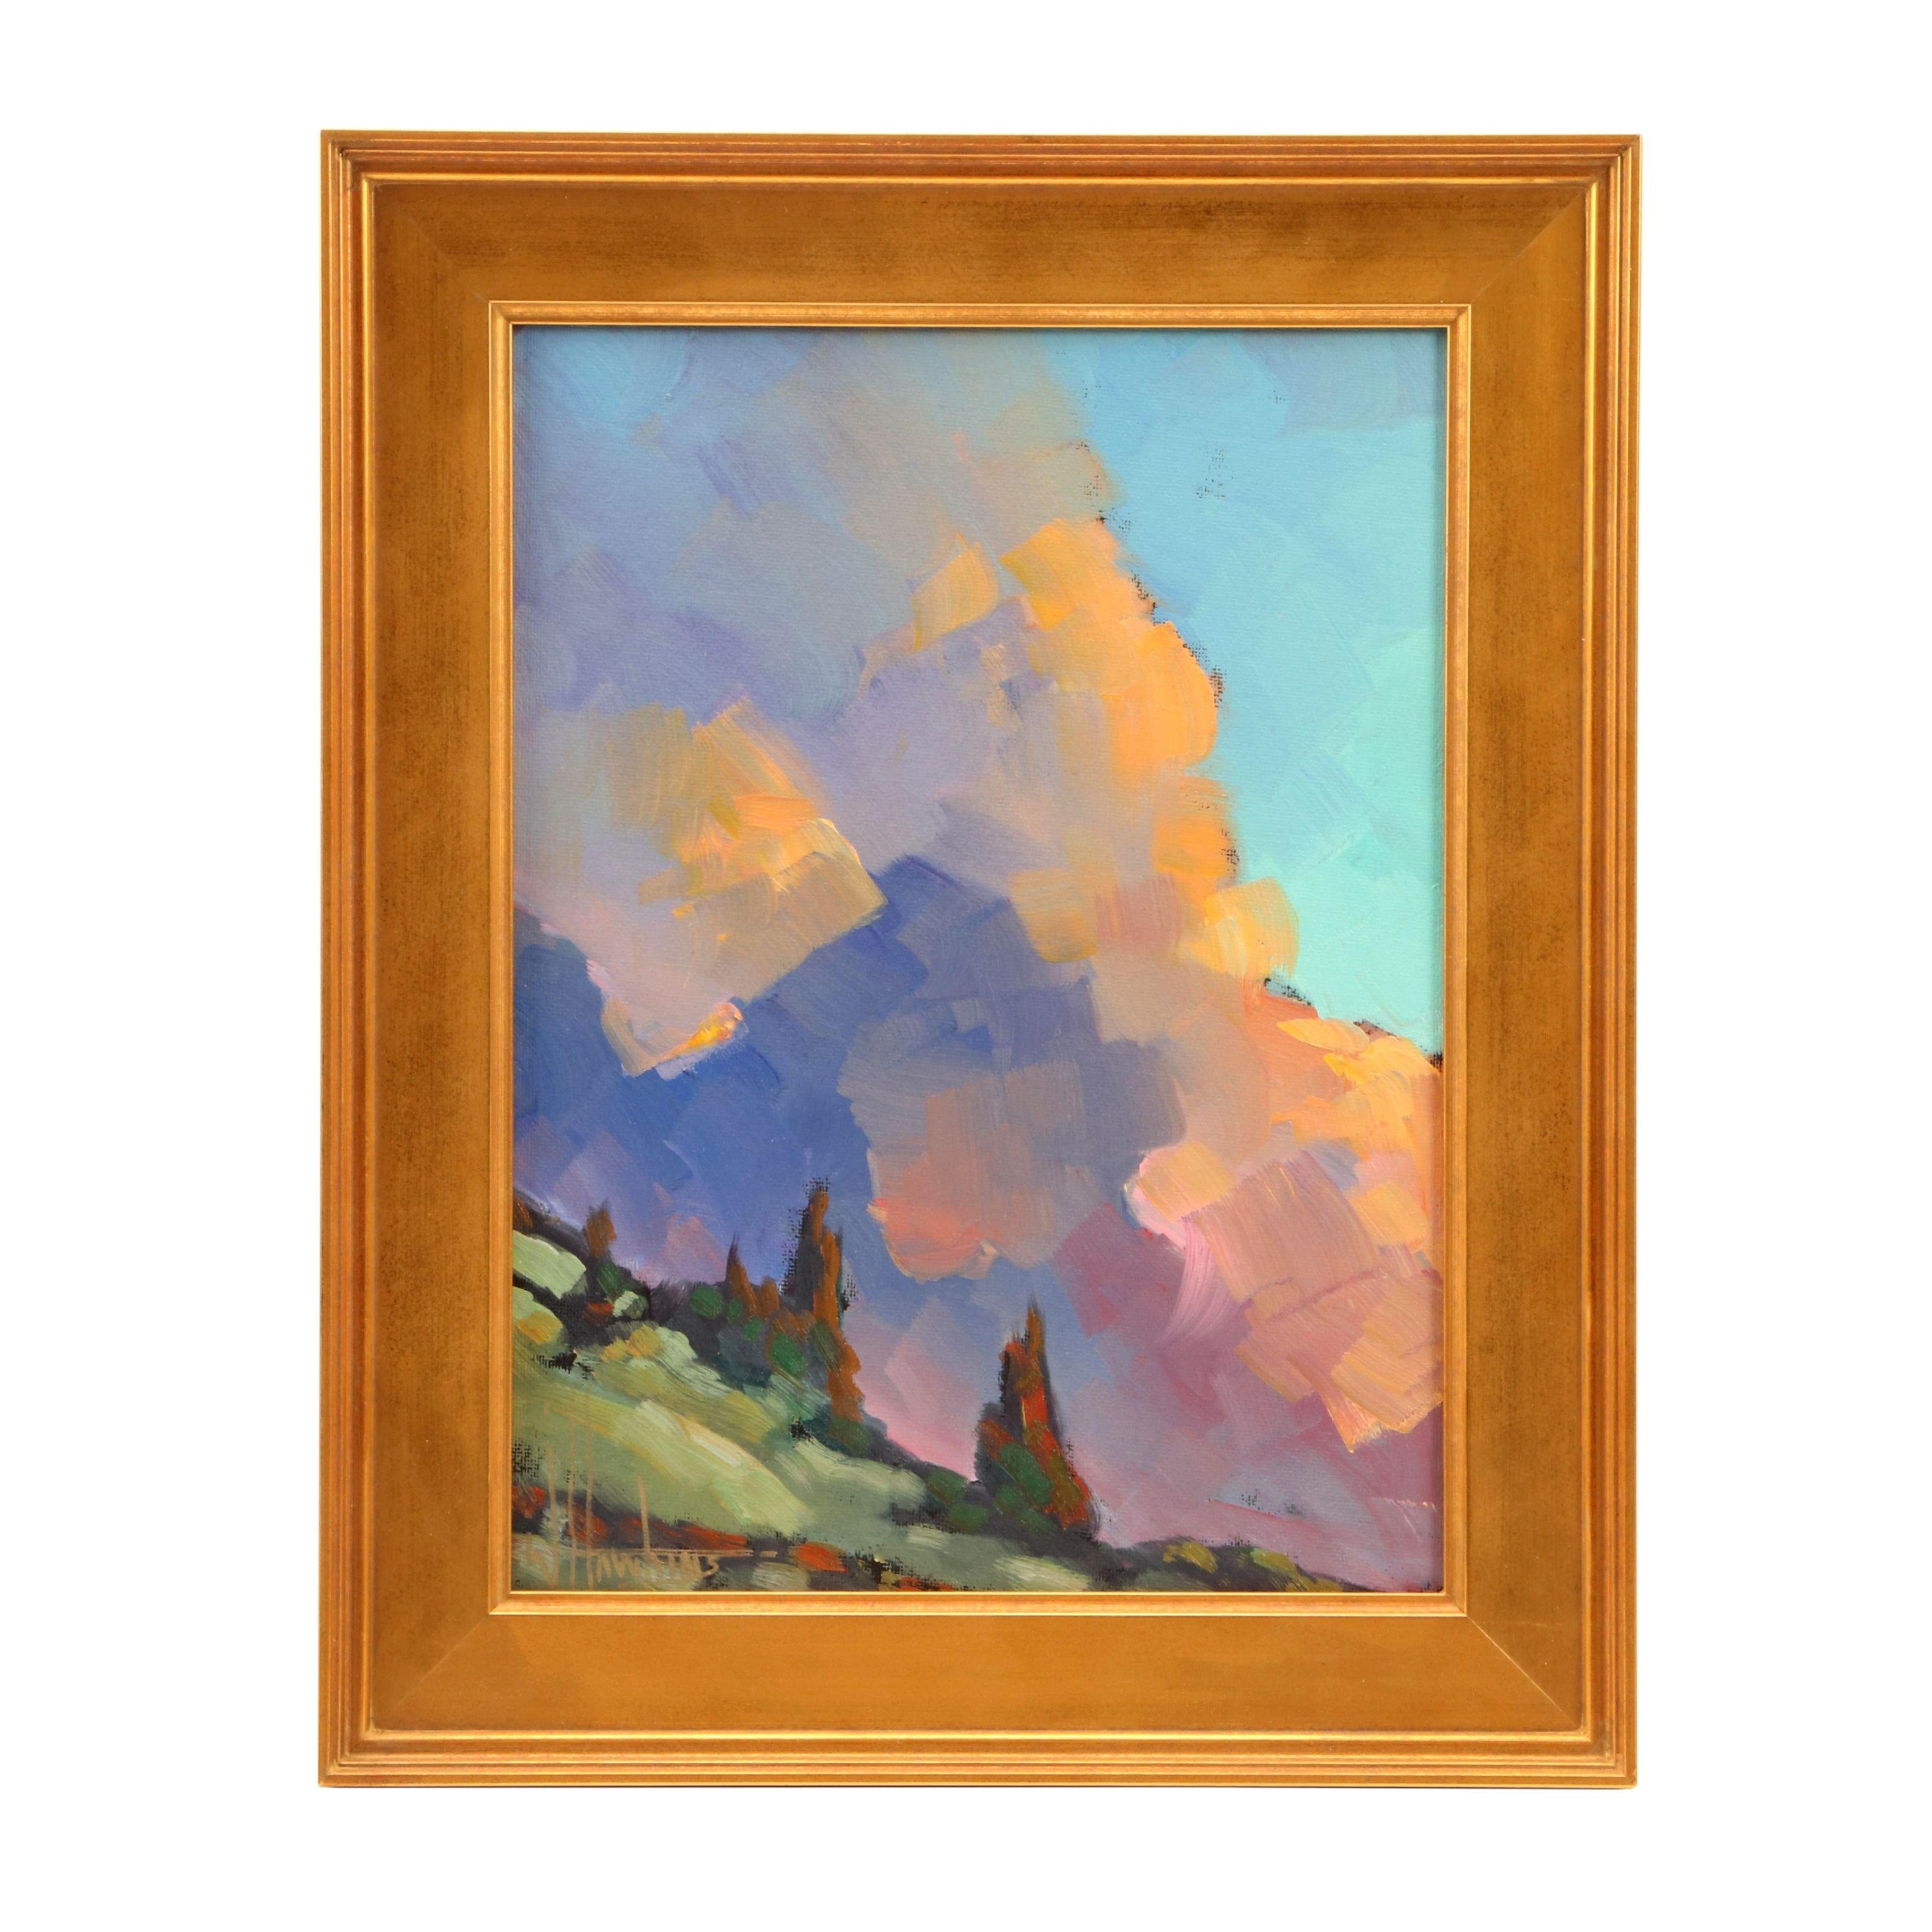 William Hawkins Oil Landscape Painting